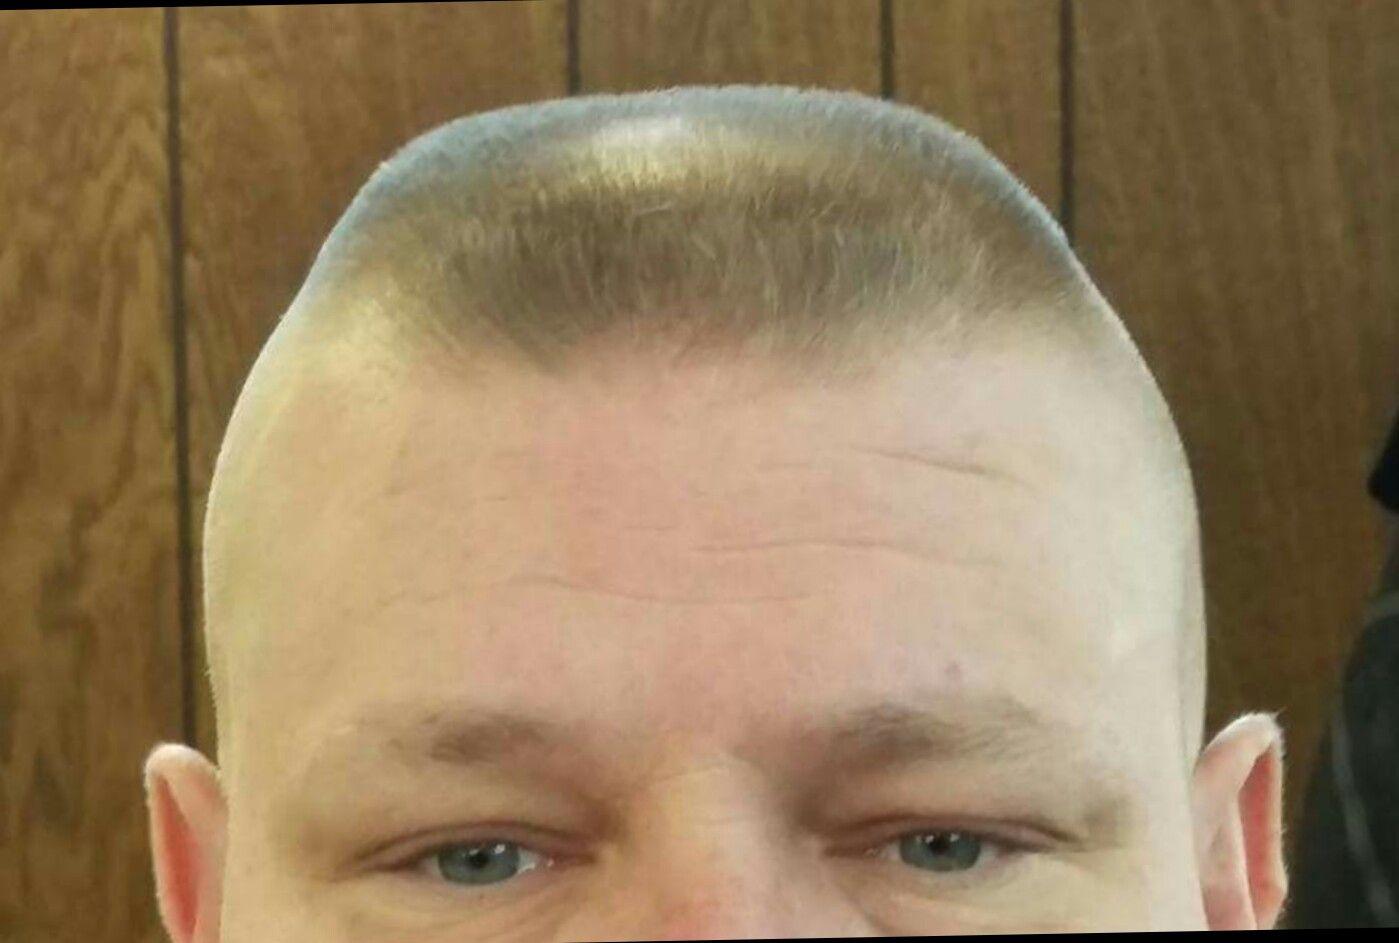 High And Tight Flat Top Haircut Flat Top Haircut High And Tight Haircut Mens Hairstyles